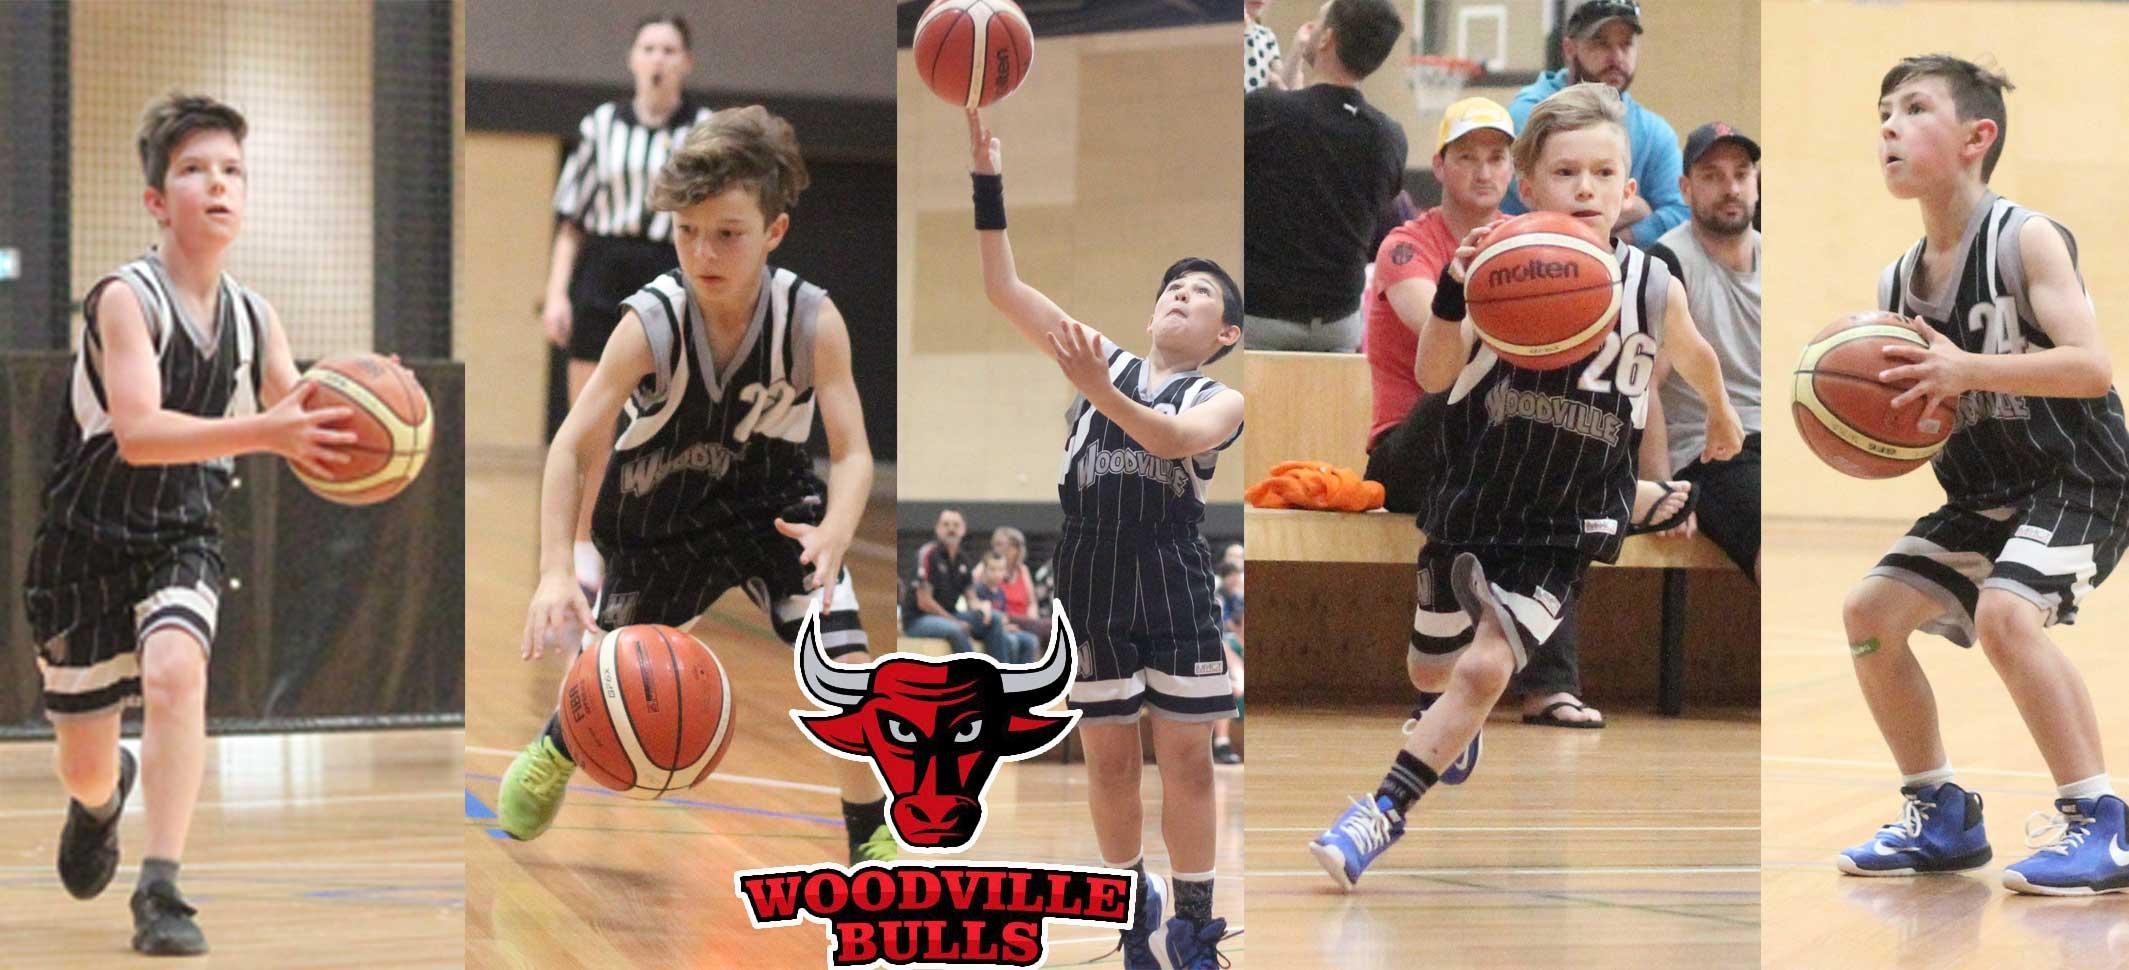 Woodville BULLS.